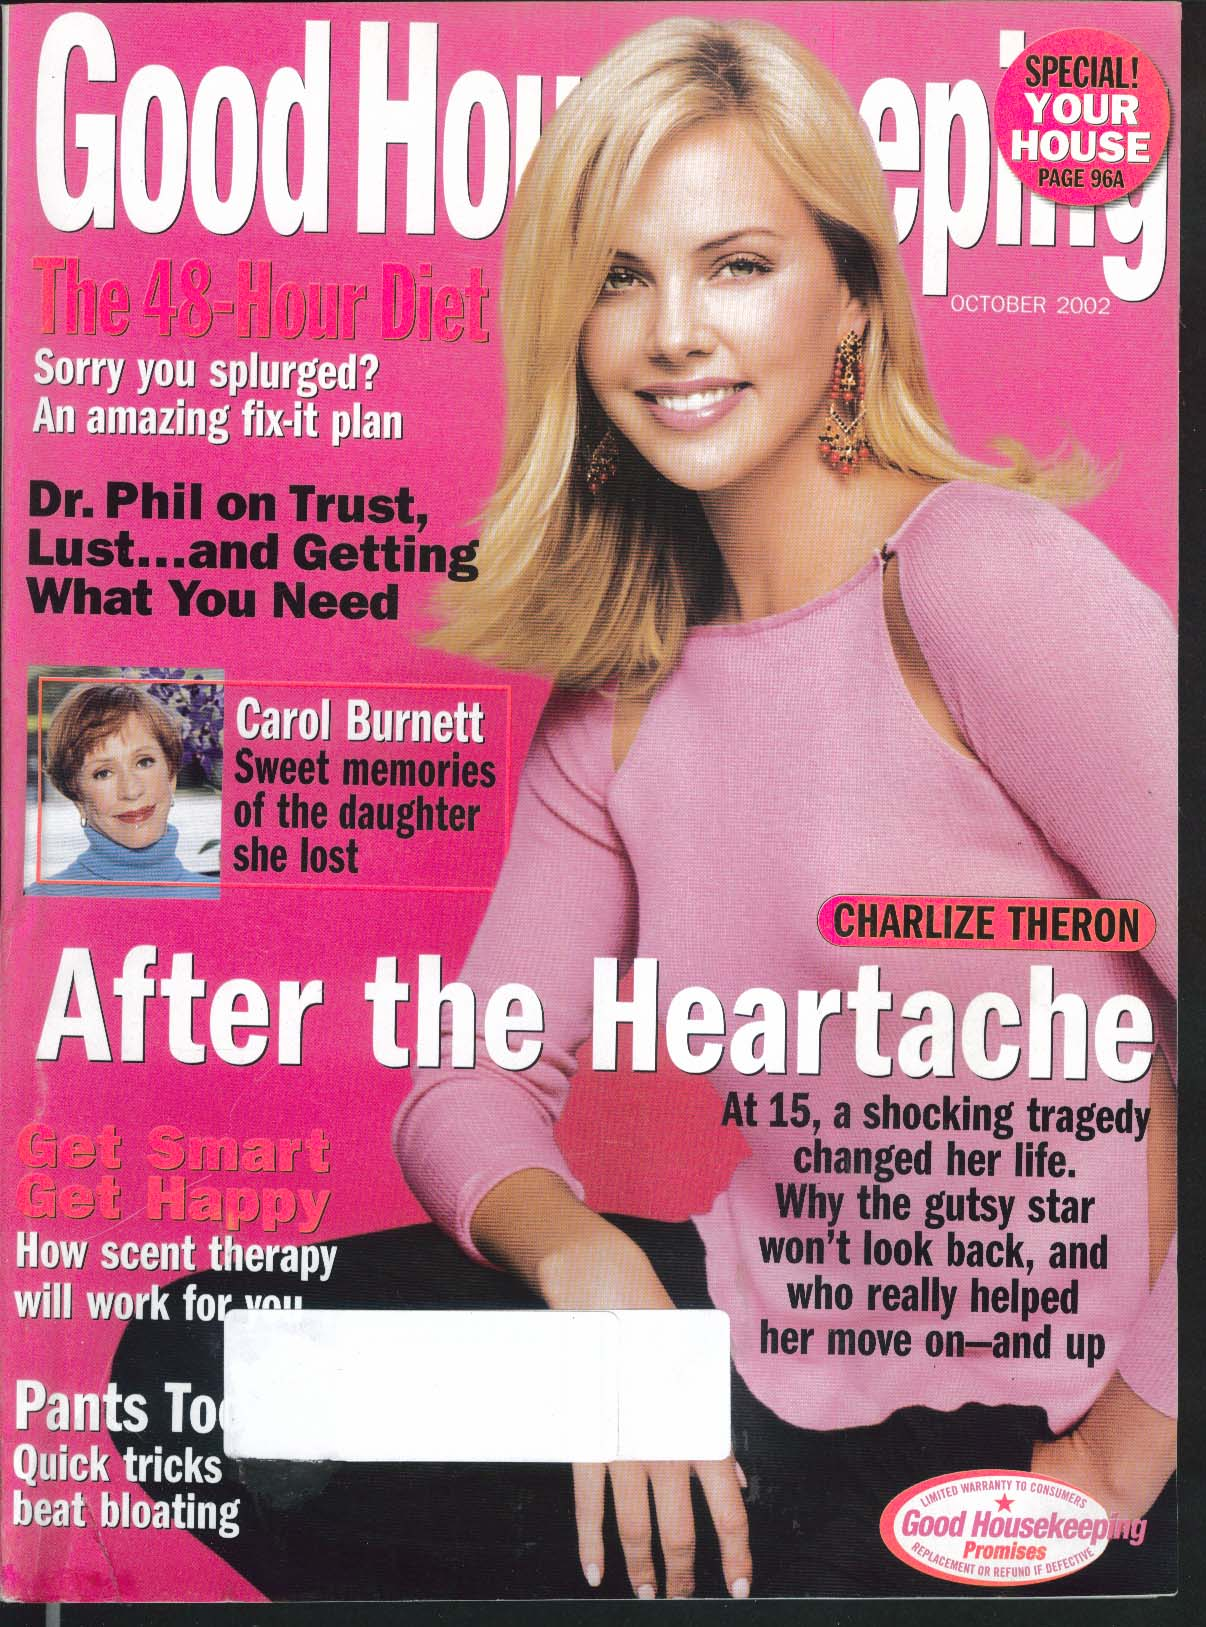 GOOD HOUSEKEEPING Charlize Theron Carol Burnett Dr Phil + 10 2002